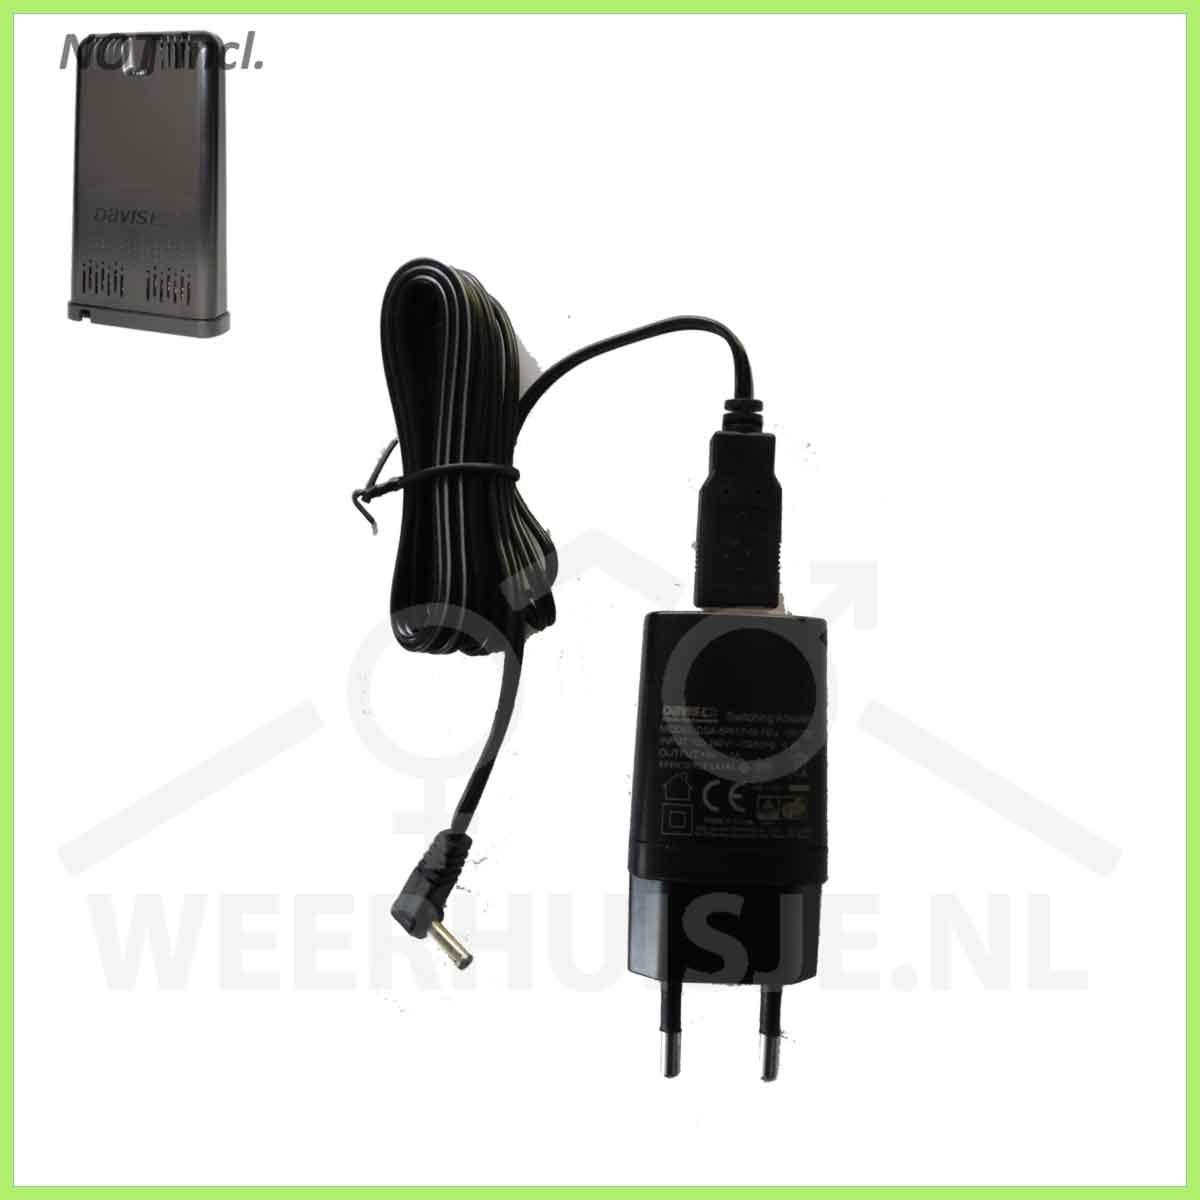 Davis 6312 | VP option | Vantage Pro2 console - draadloos